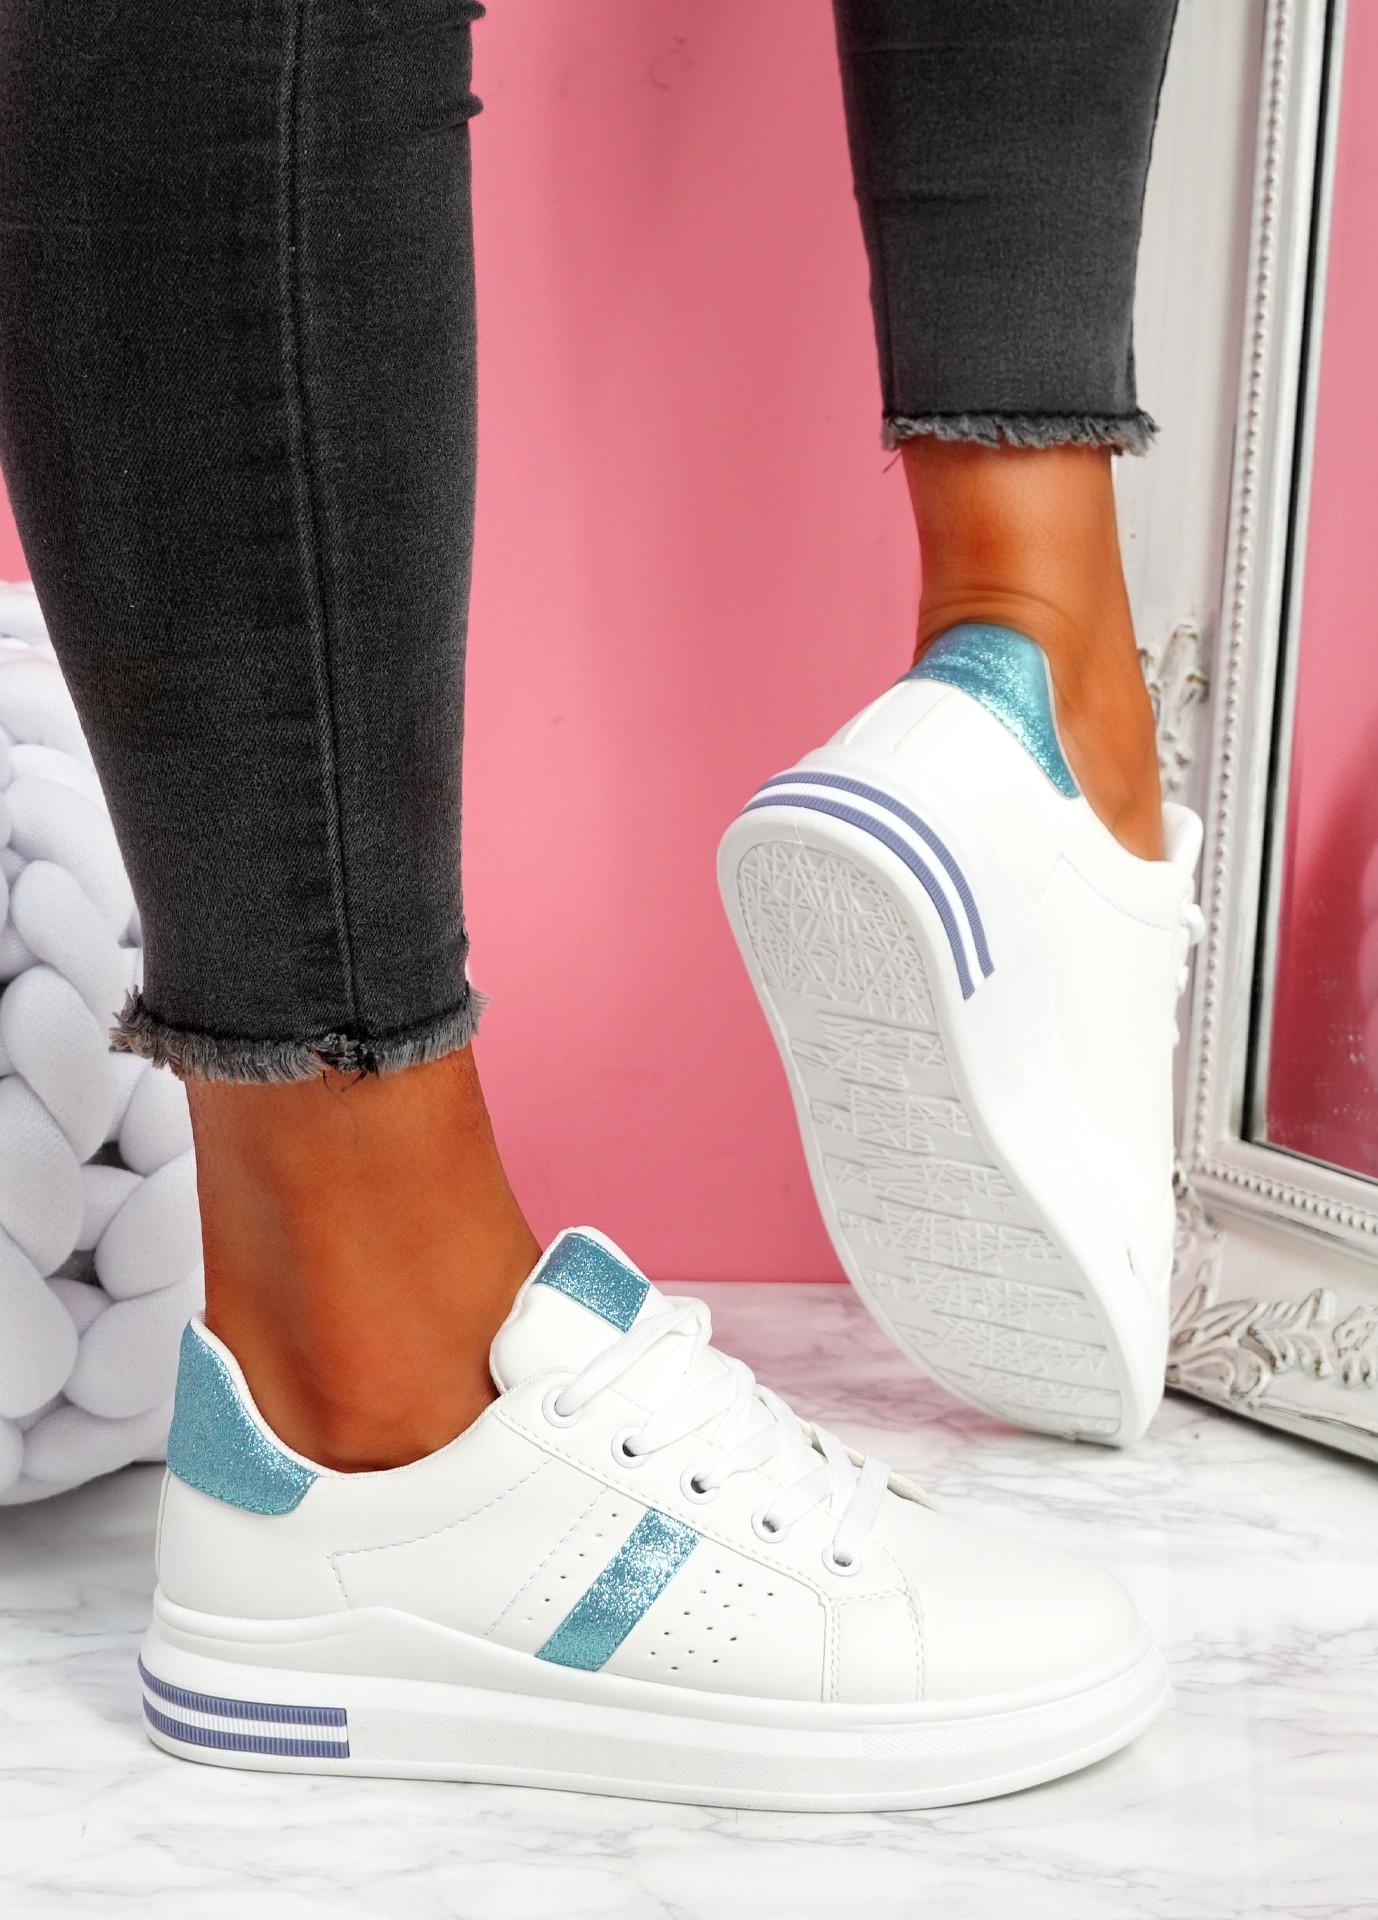 Juwe White Blue Platform Glitter Trainers